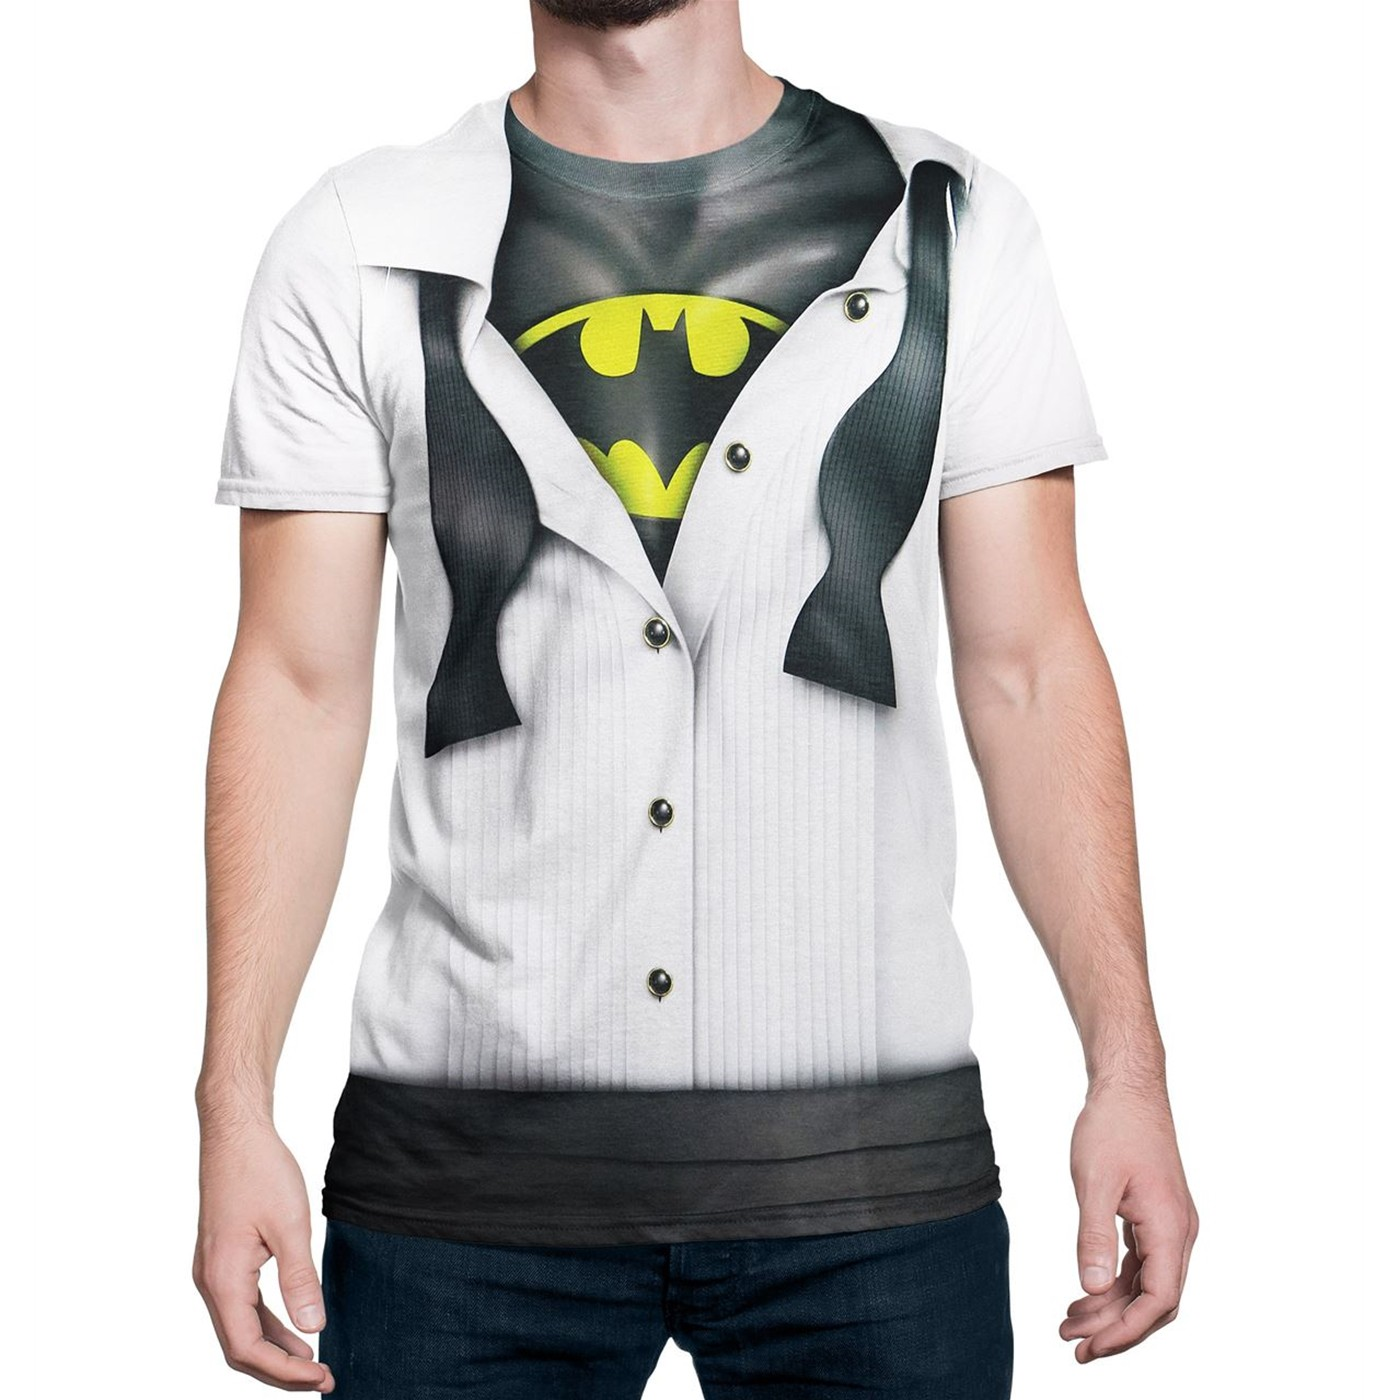 Batman Tuxedo Costume Reveal Sublimated T-Shirt